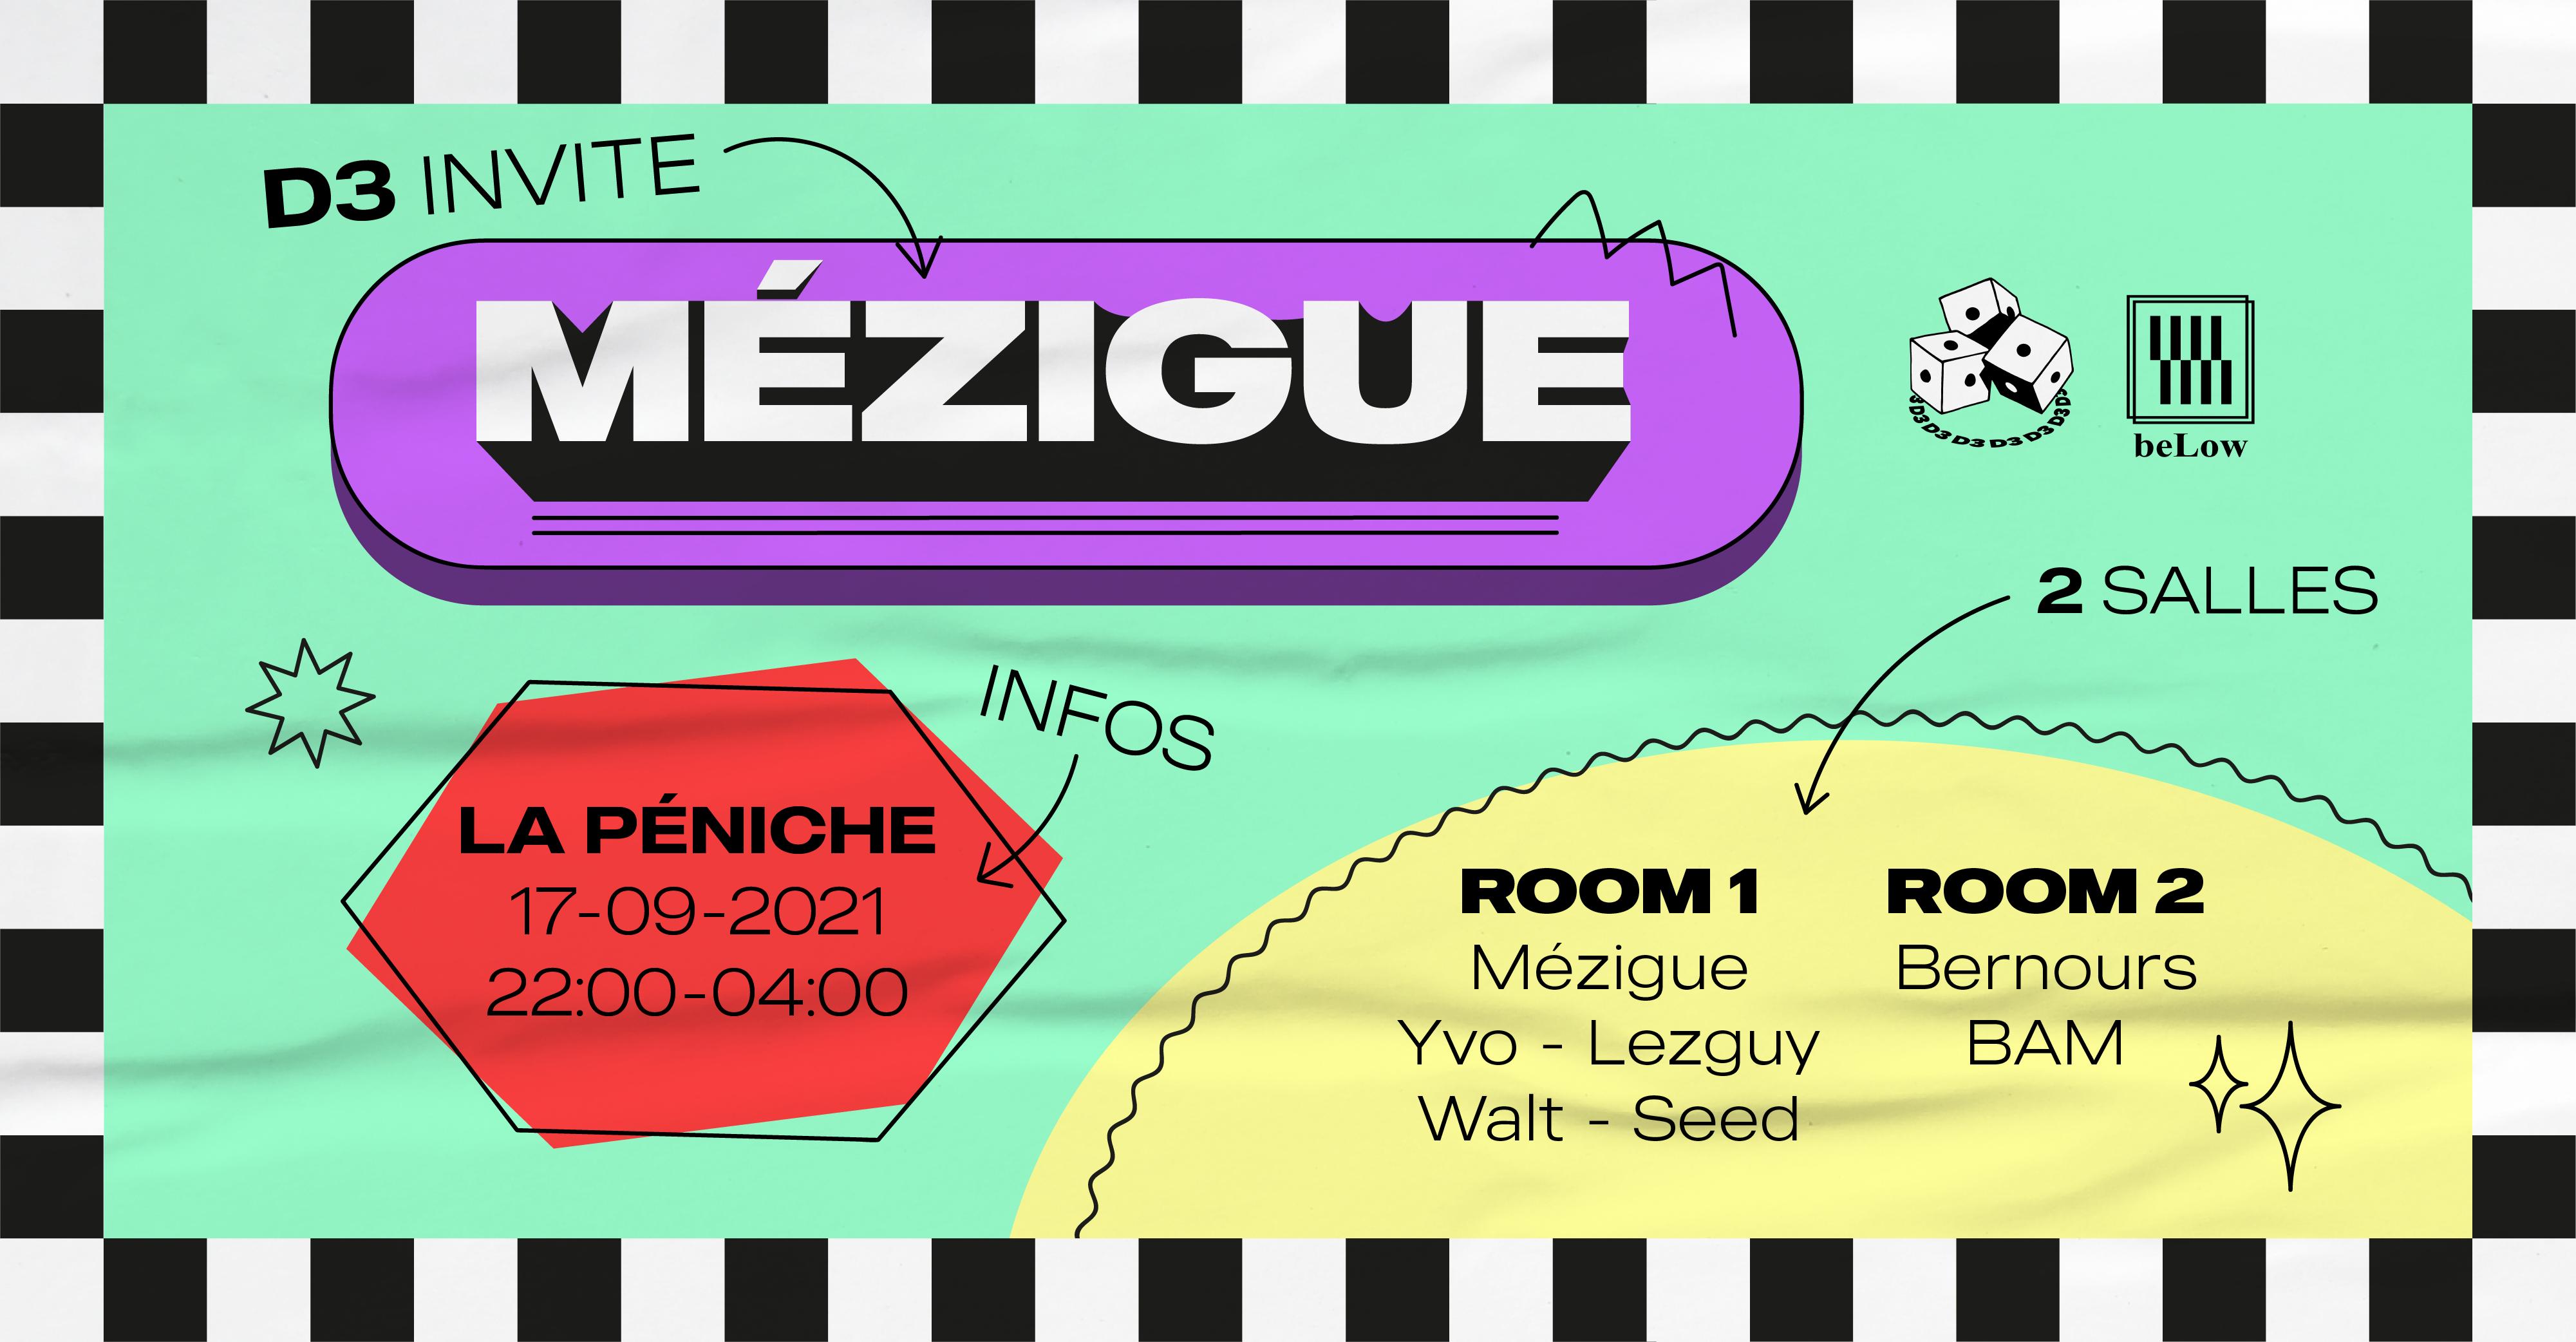 D3 invite Mézigue